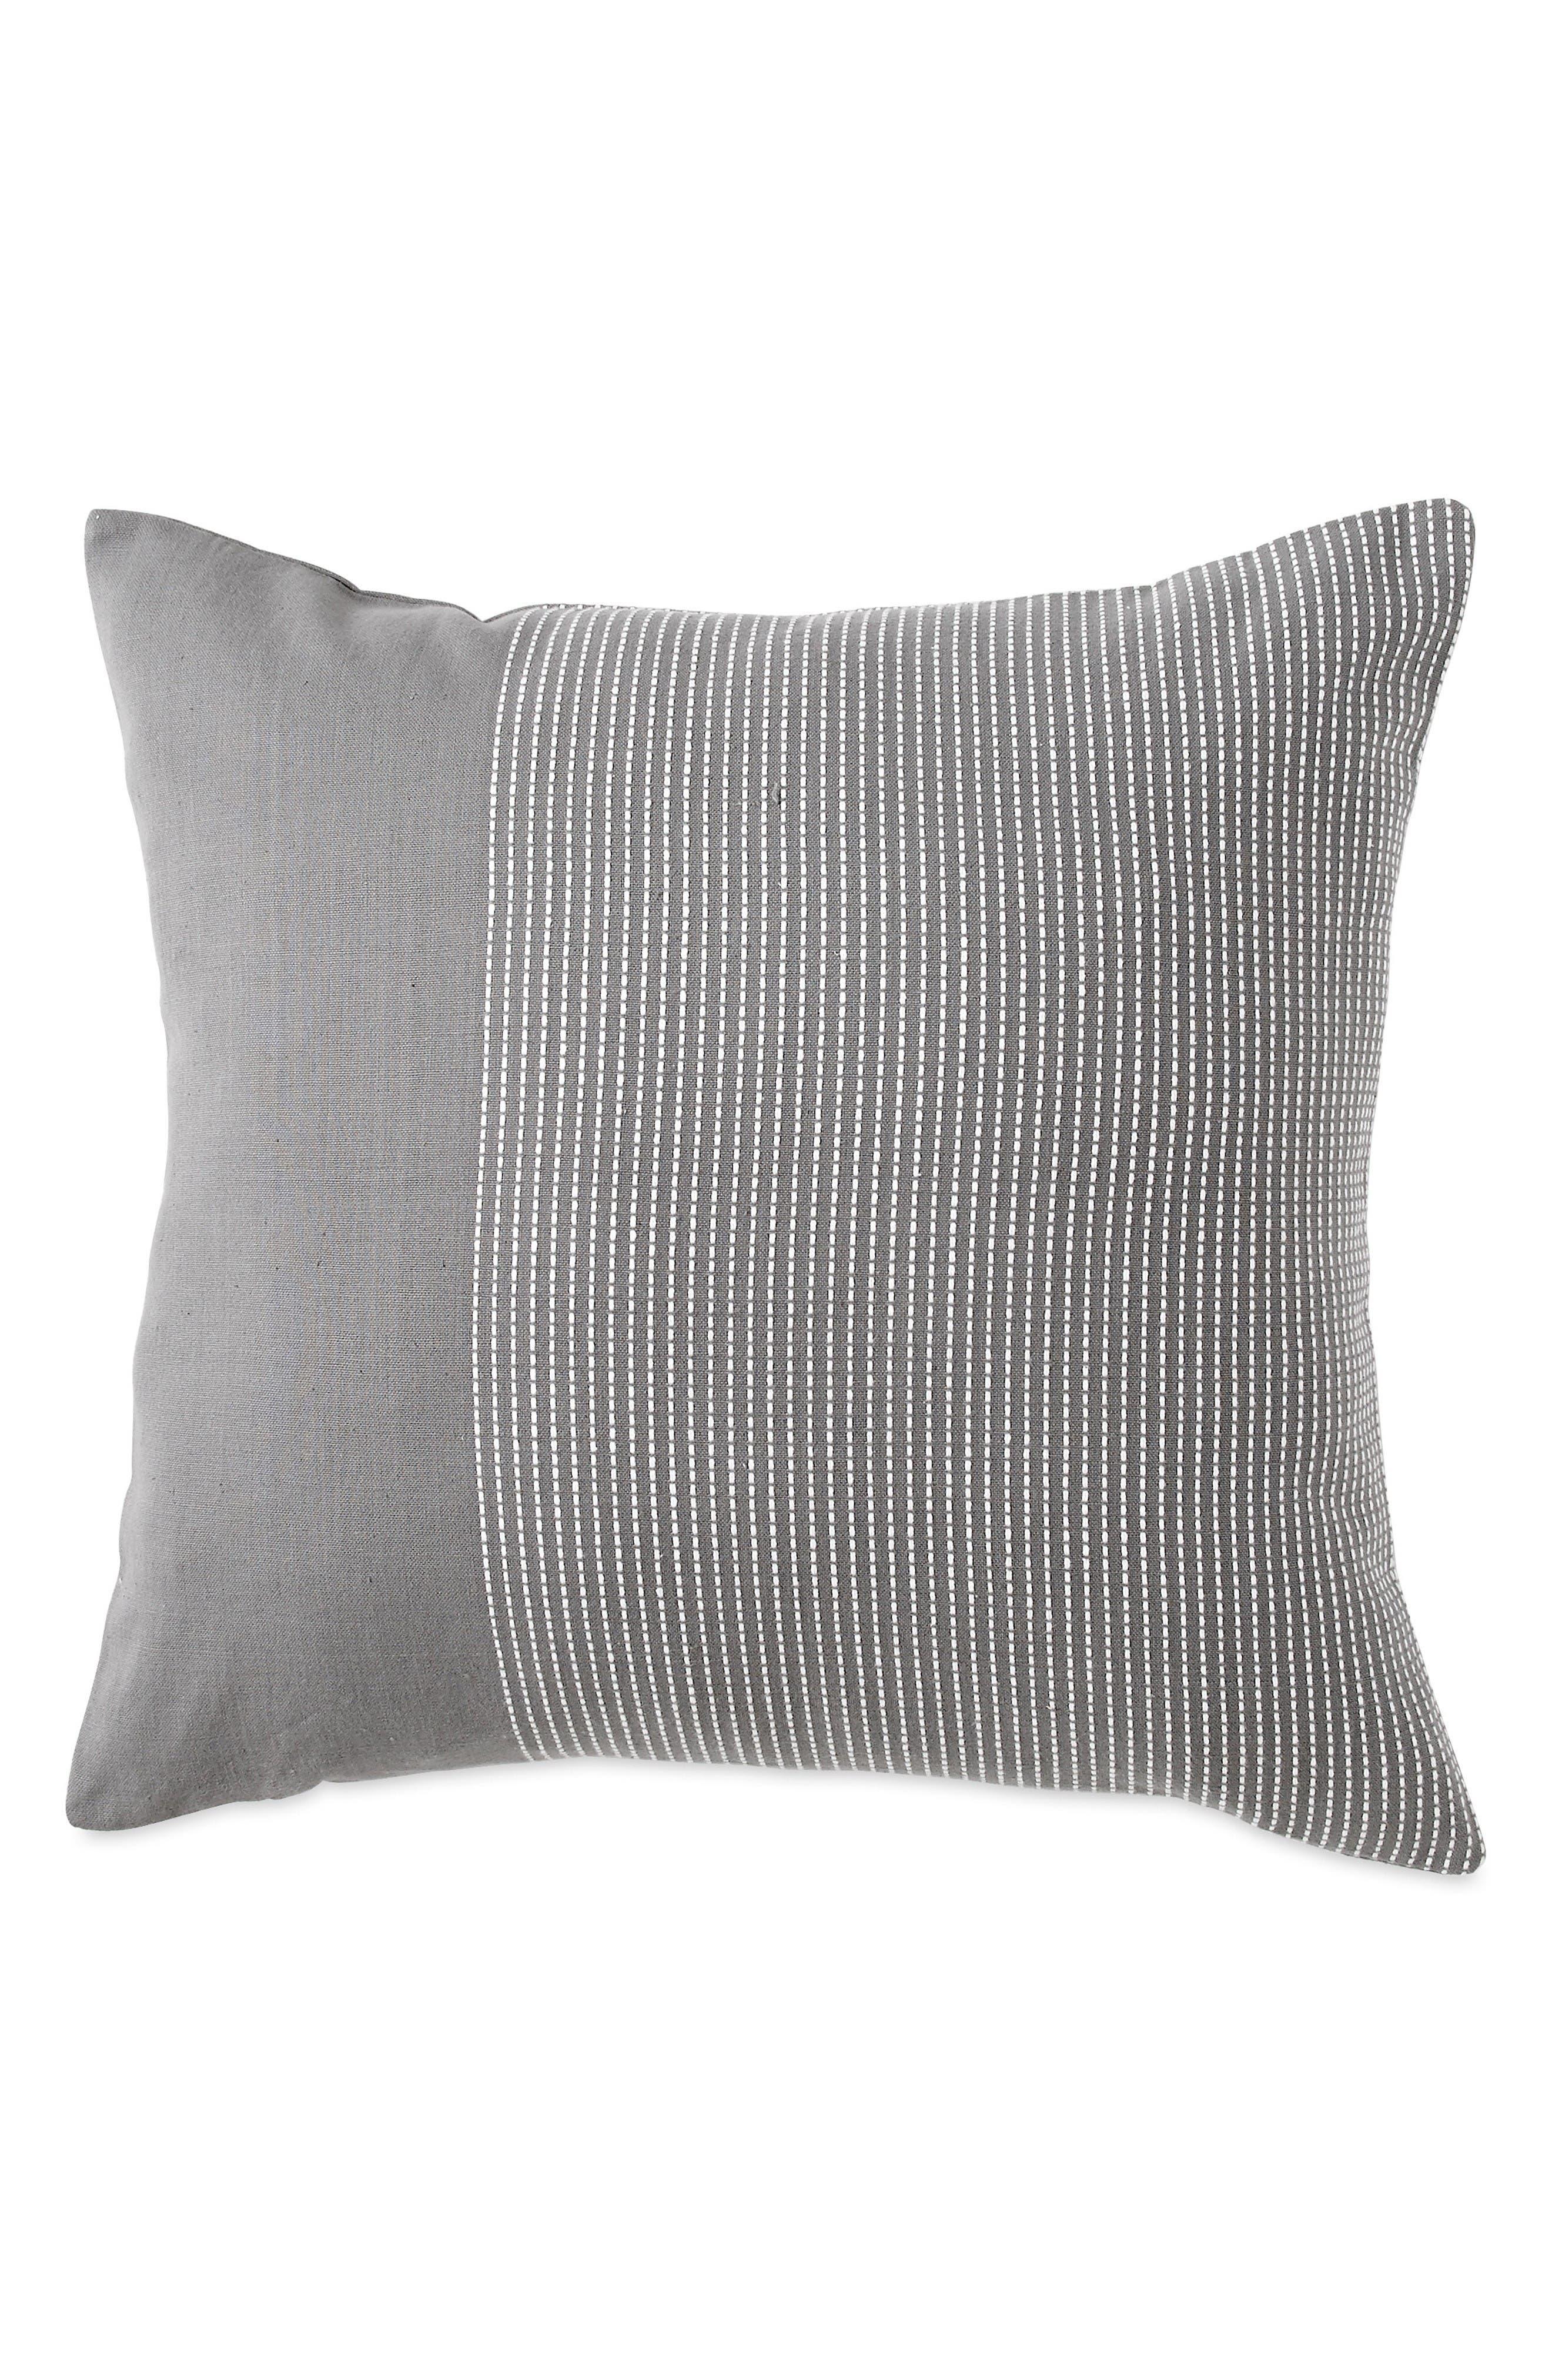 Stripe Accent Pillow,                         Main,                         color, Grey